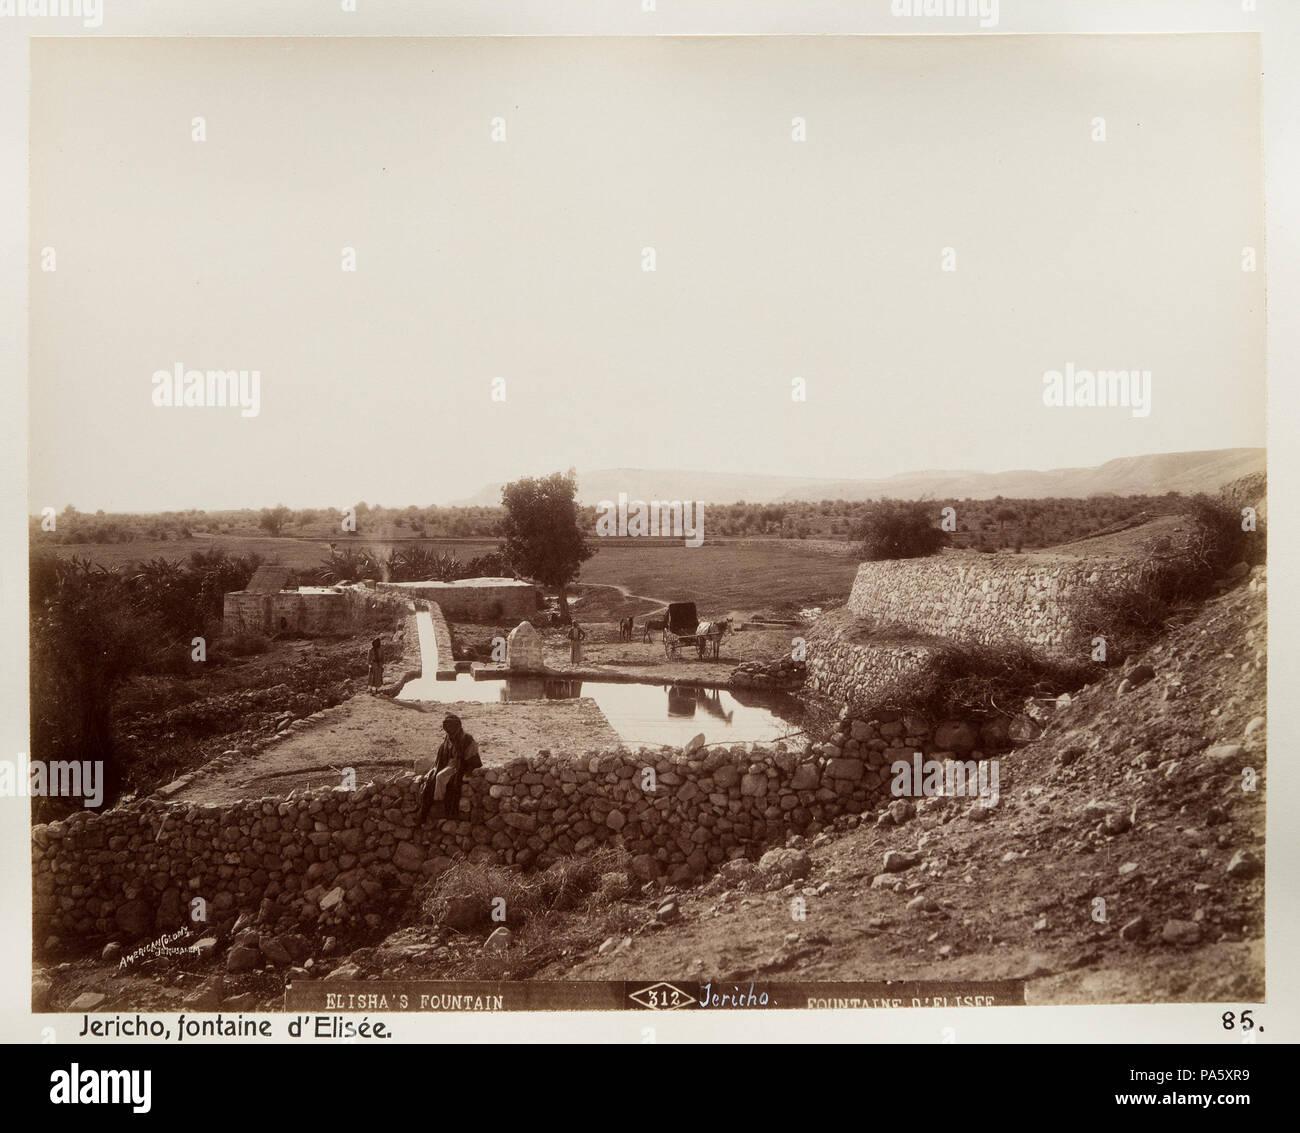 Inv.nr:LXVI:N.85. 90 Fotografi från Jeriko - Hallwylska museet - 104429 - Stock Image